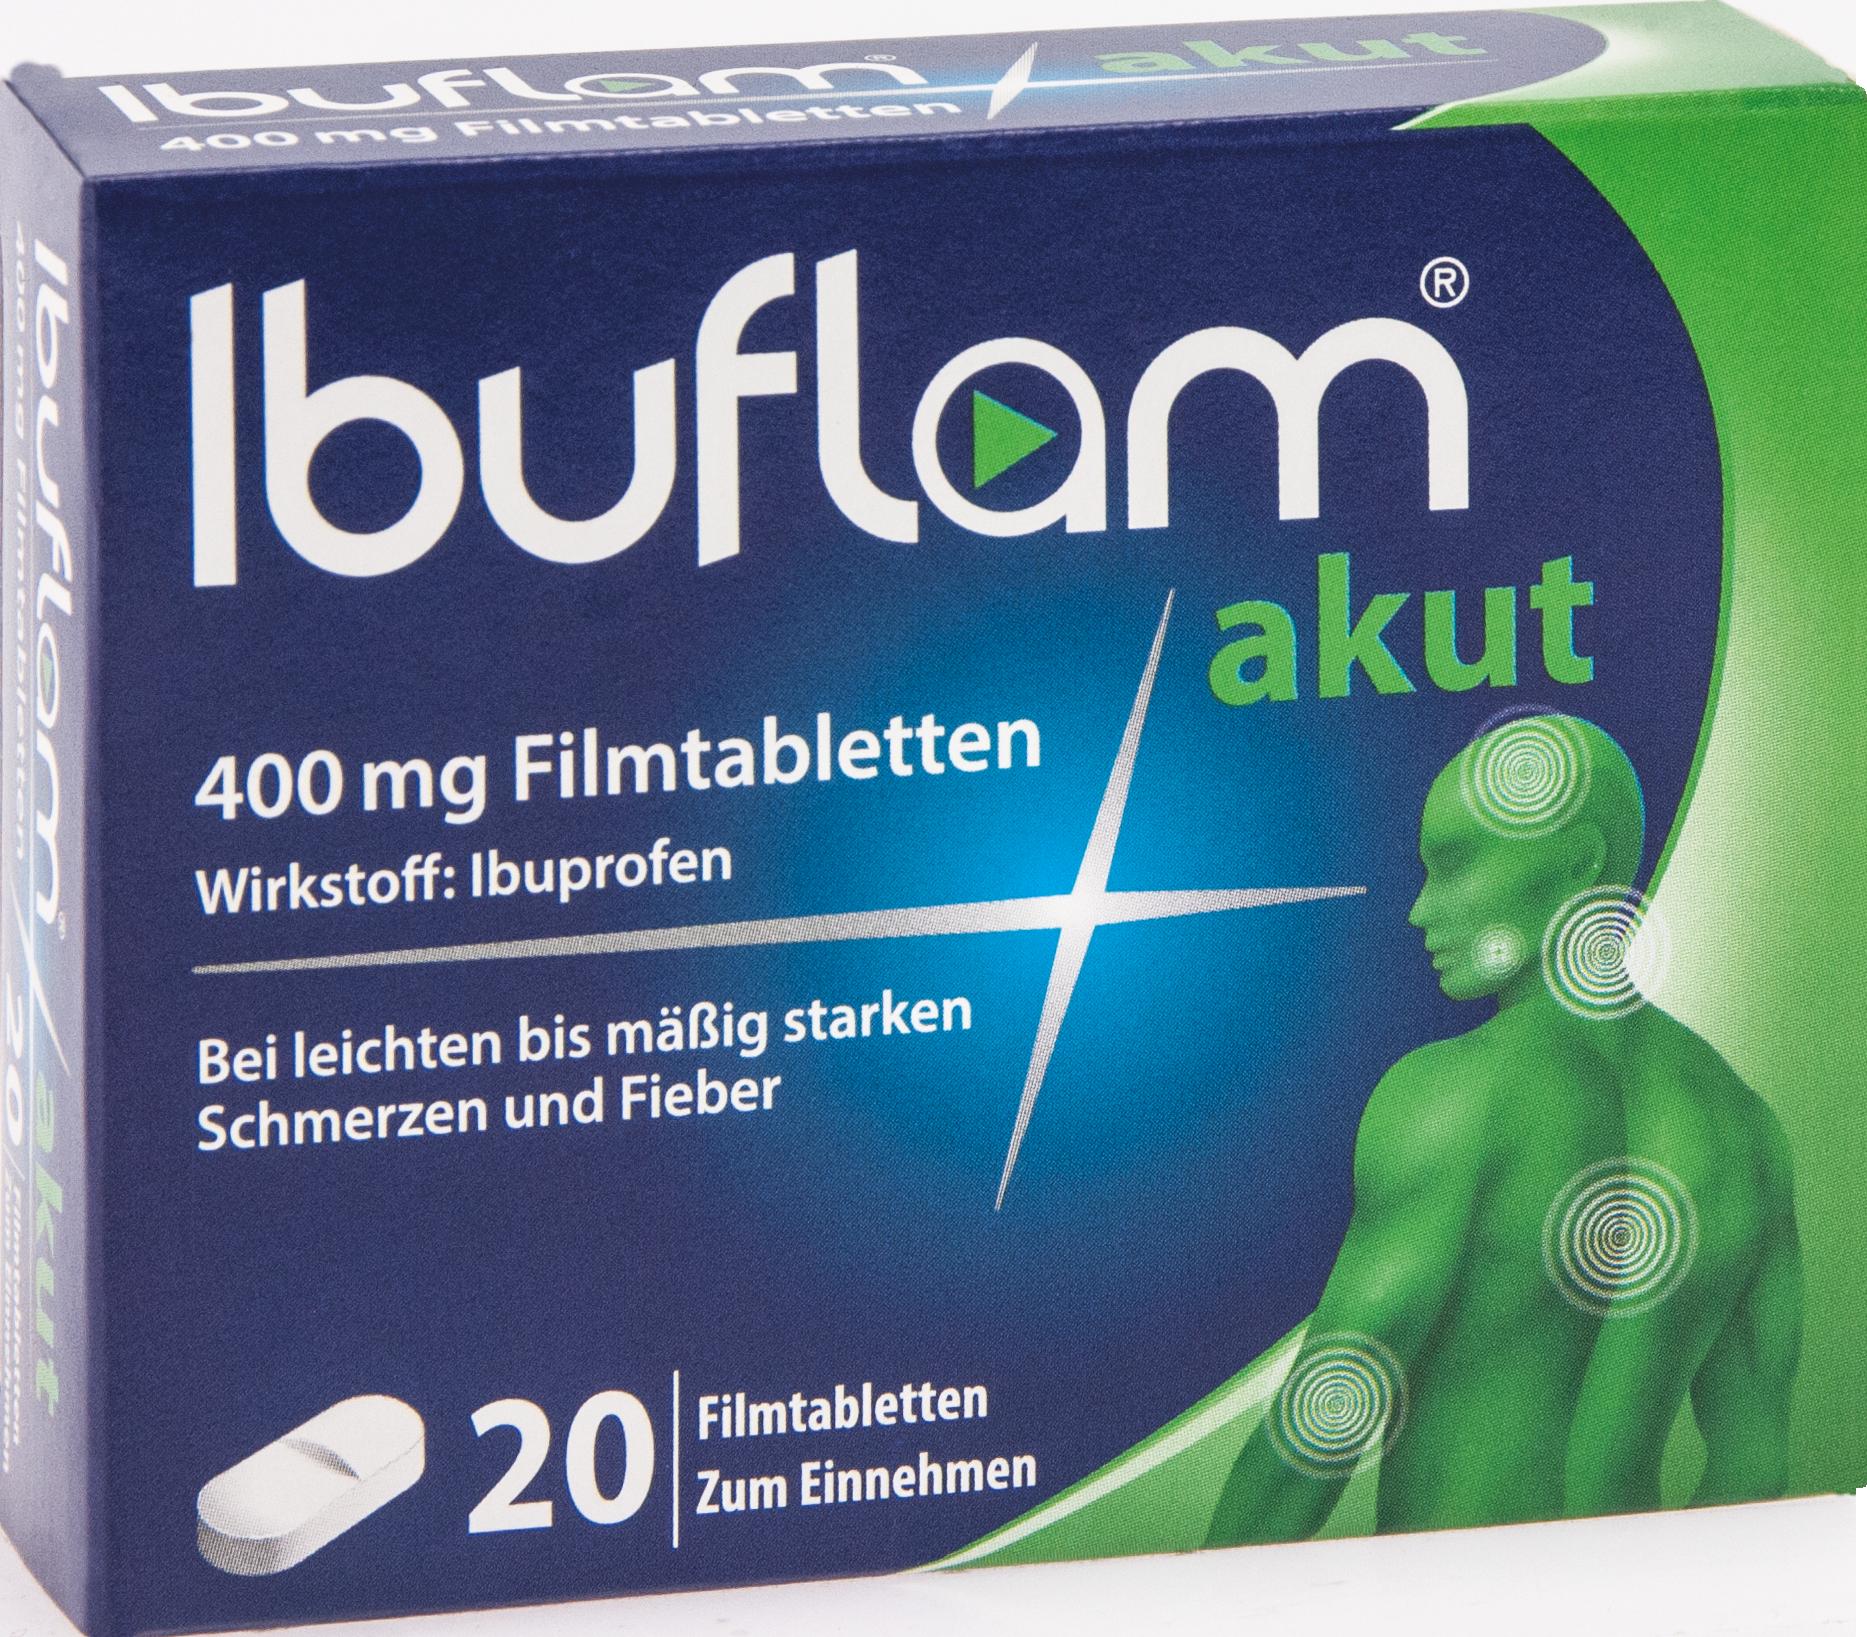 Ibuflam akut 400mg Filmtabletten